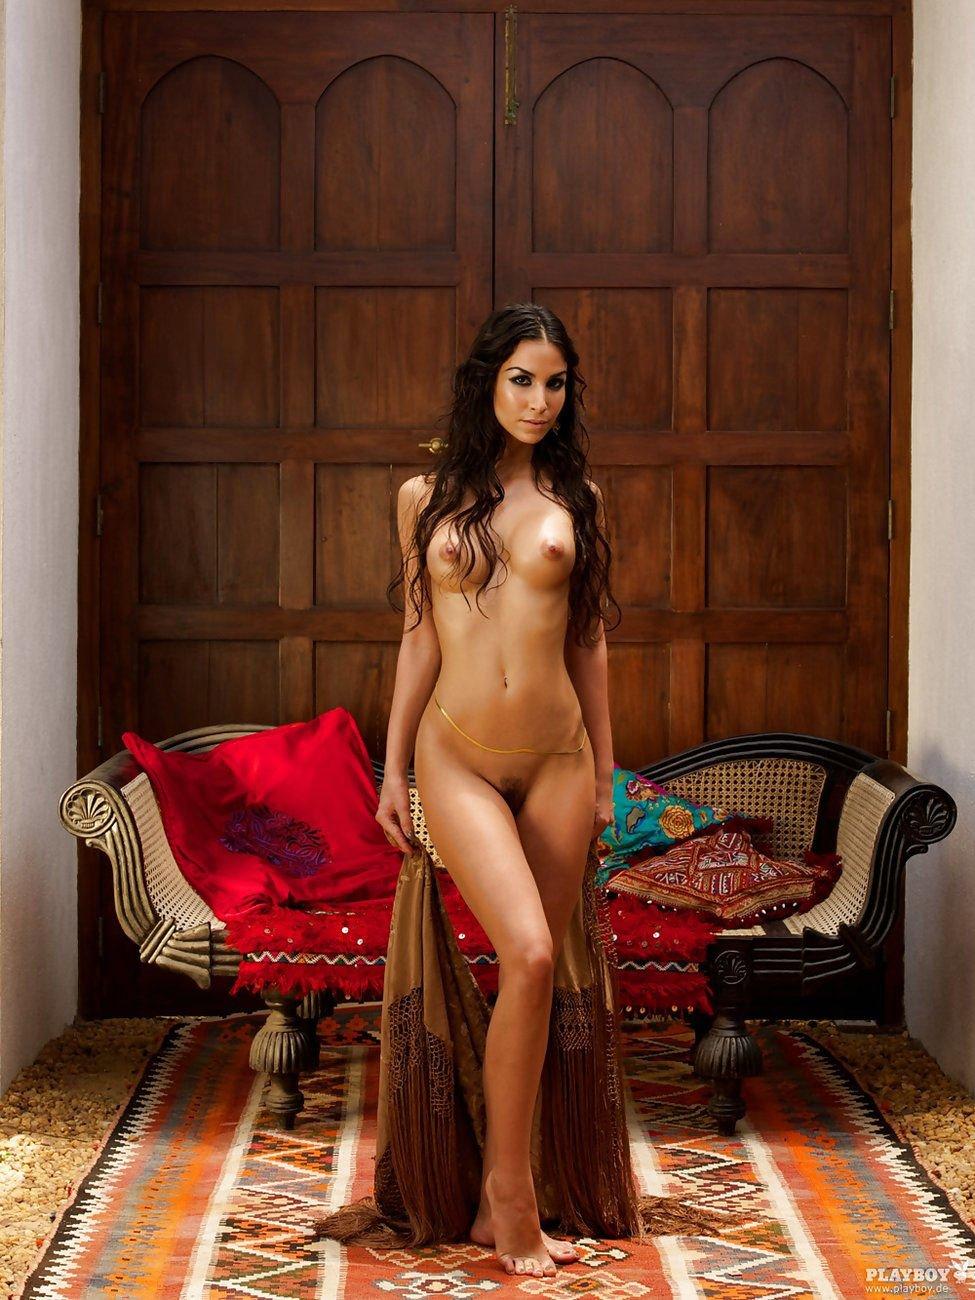 XXX Sila Sahin nudes (19 photo), Tits, Bikini, Instagram, panties 2018